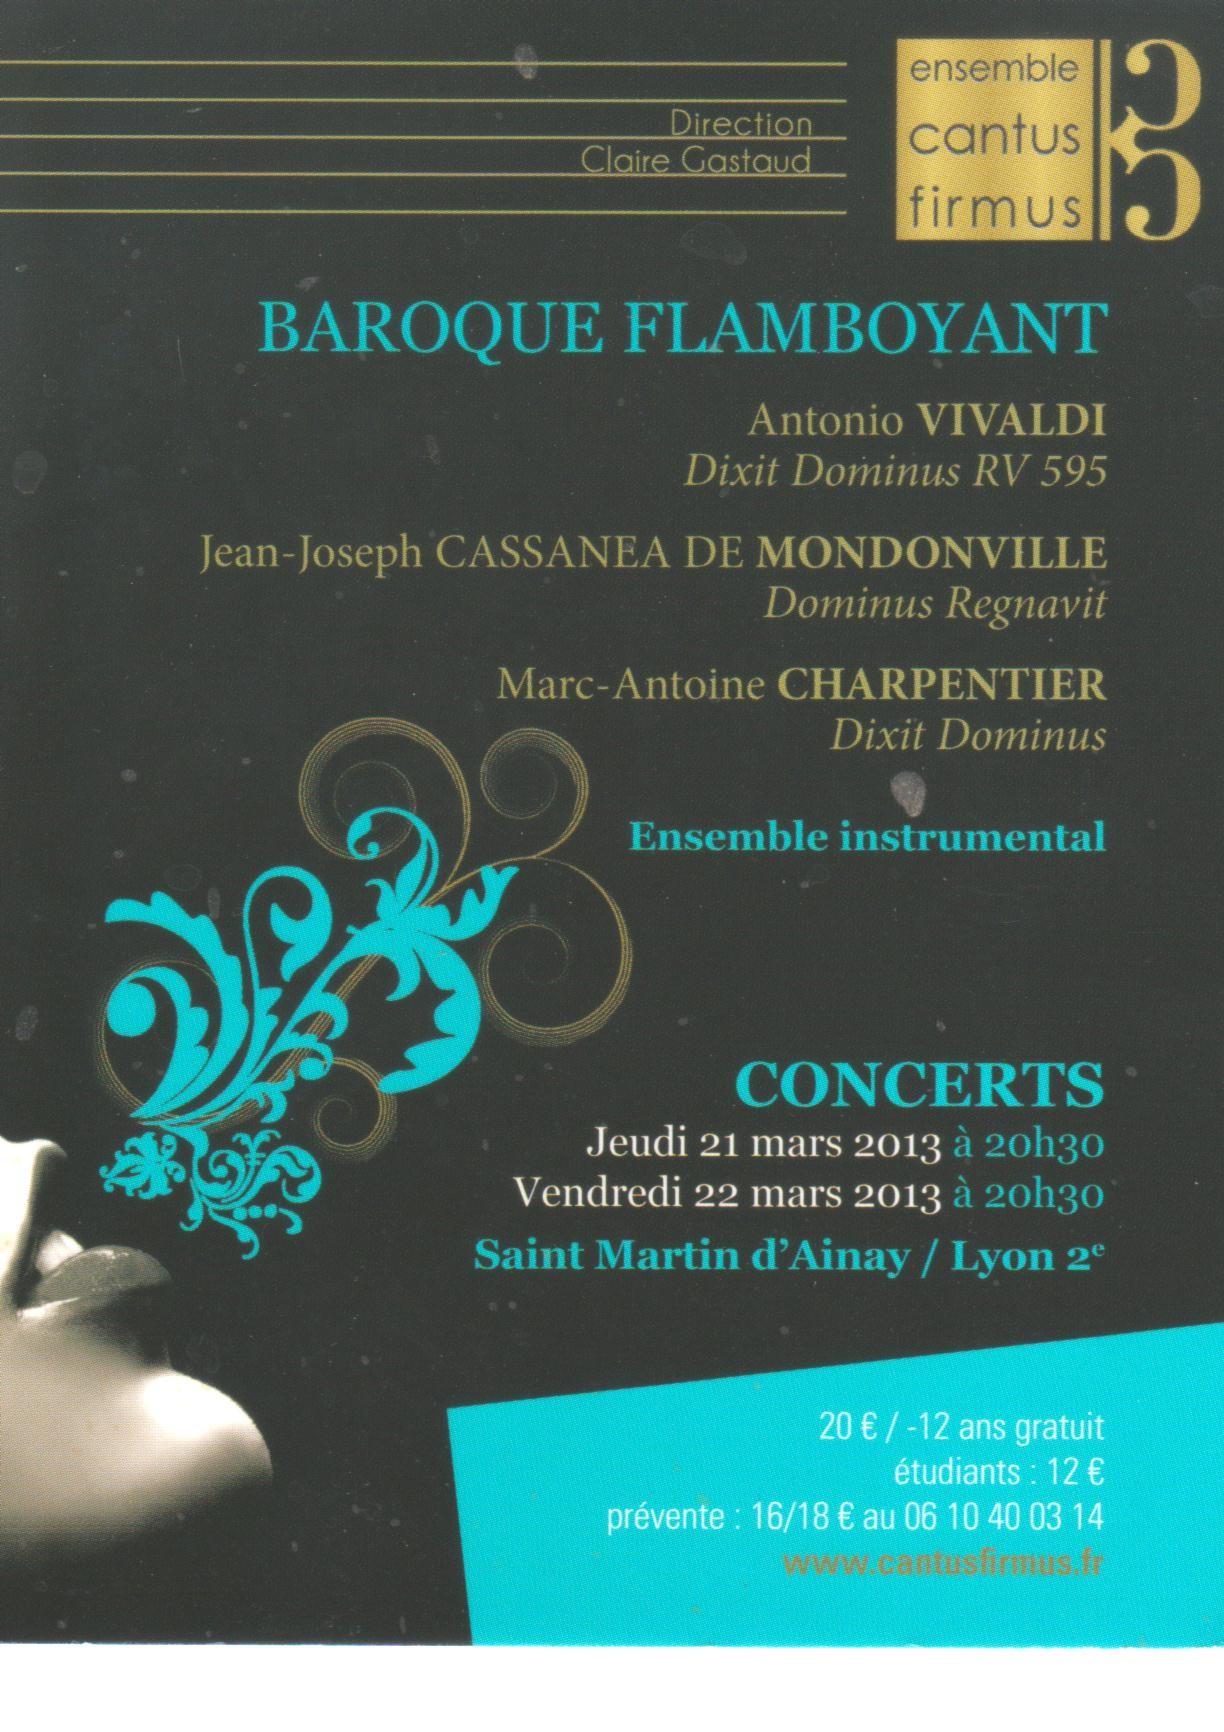 2013-03_BAROQUE FLAMBOYANT (1)